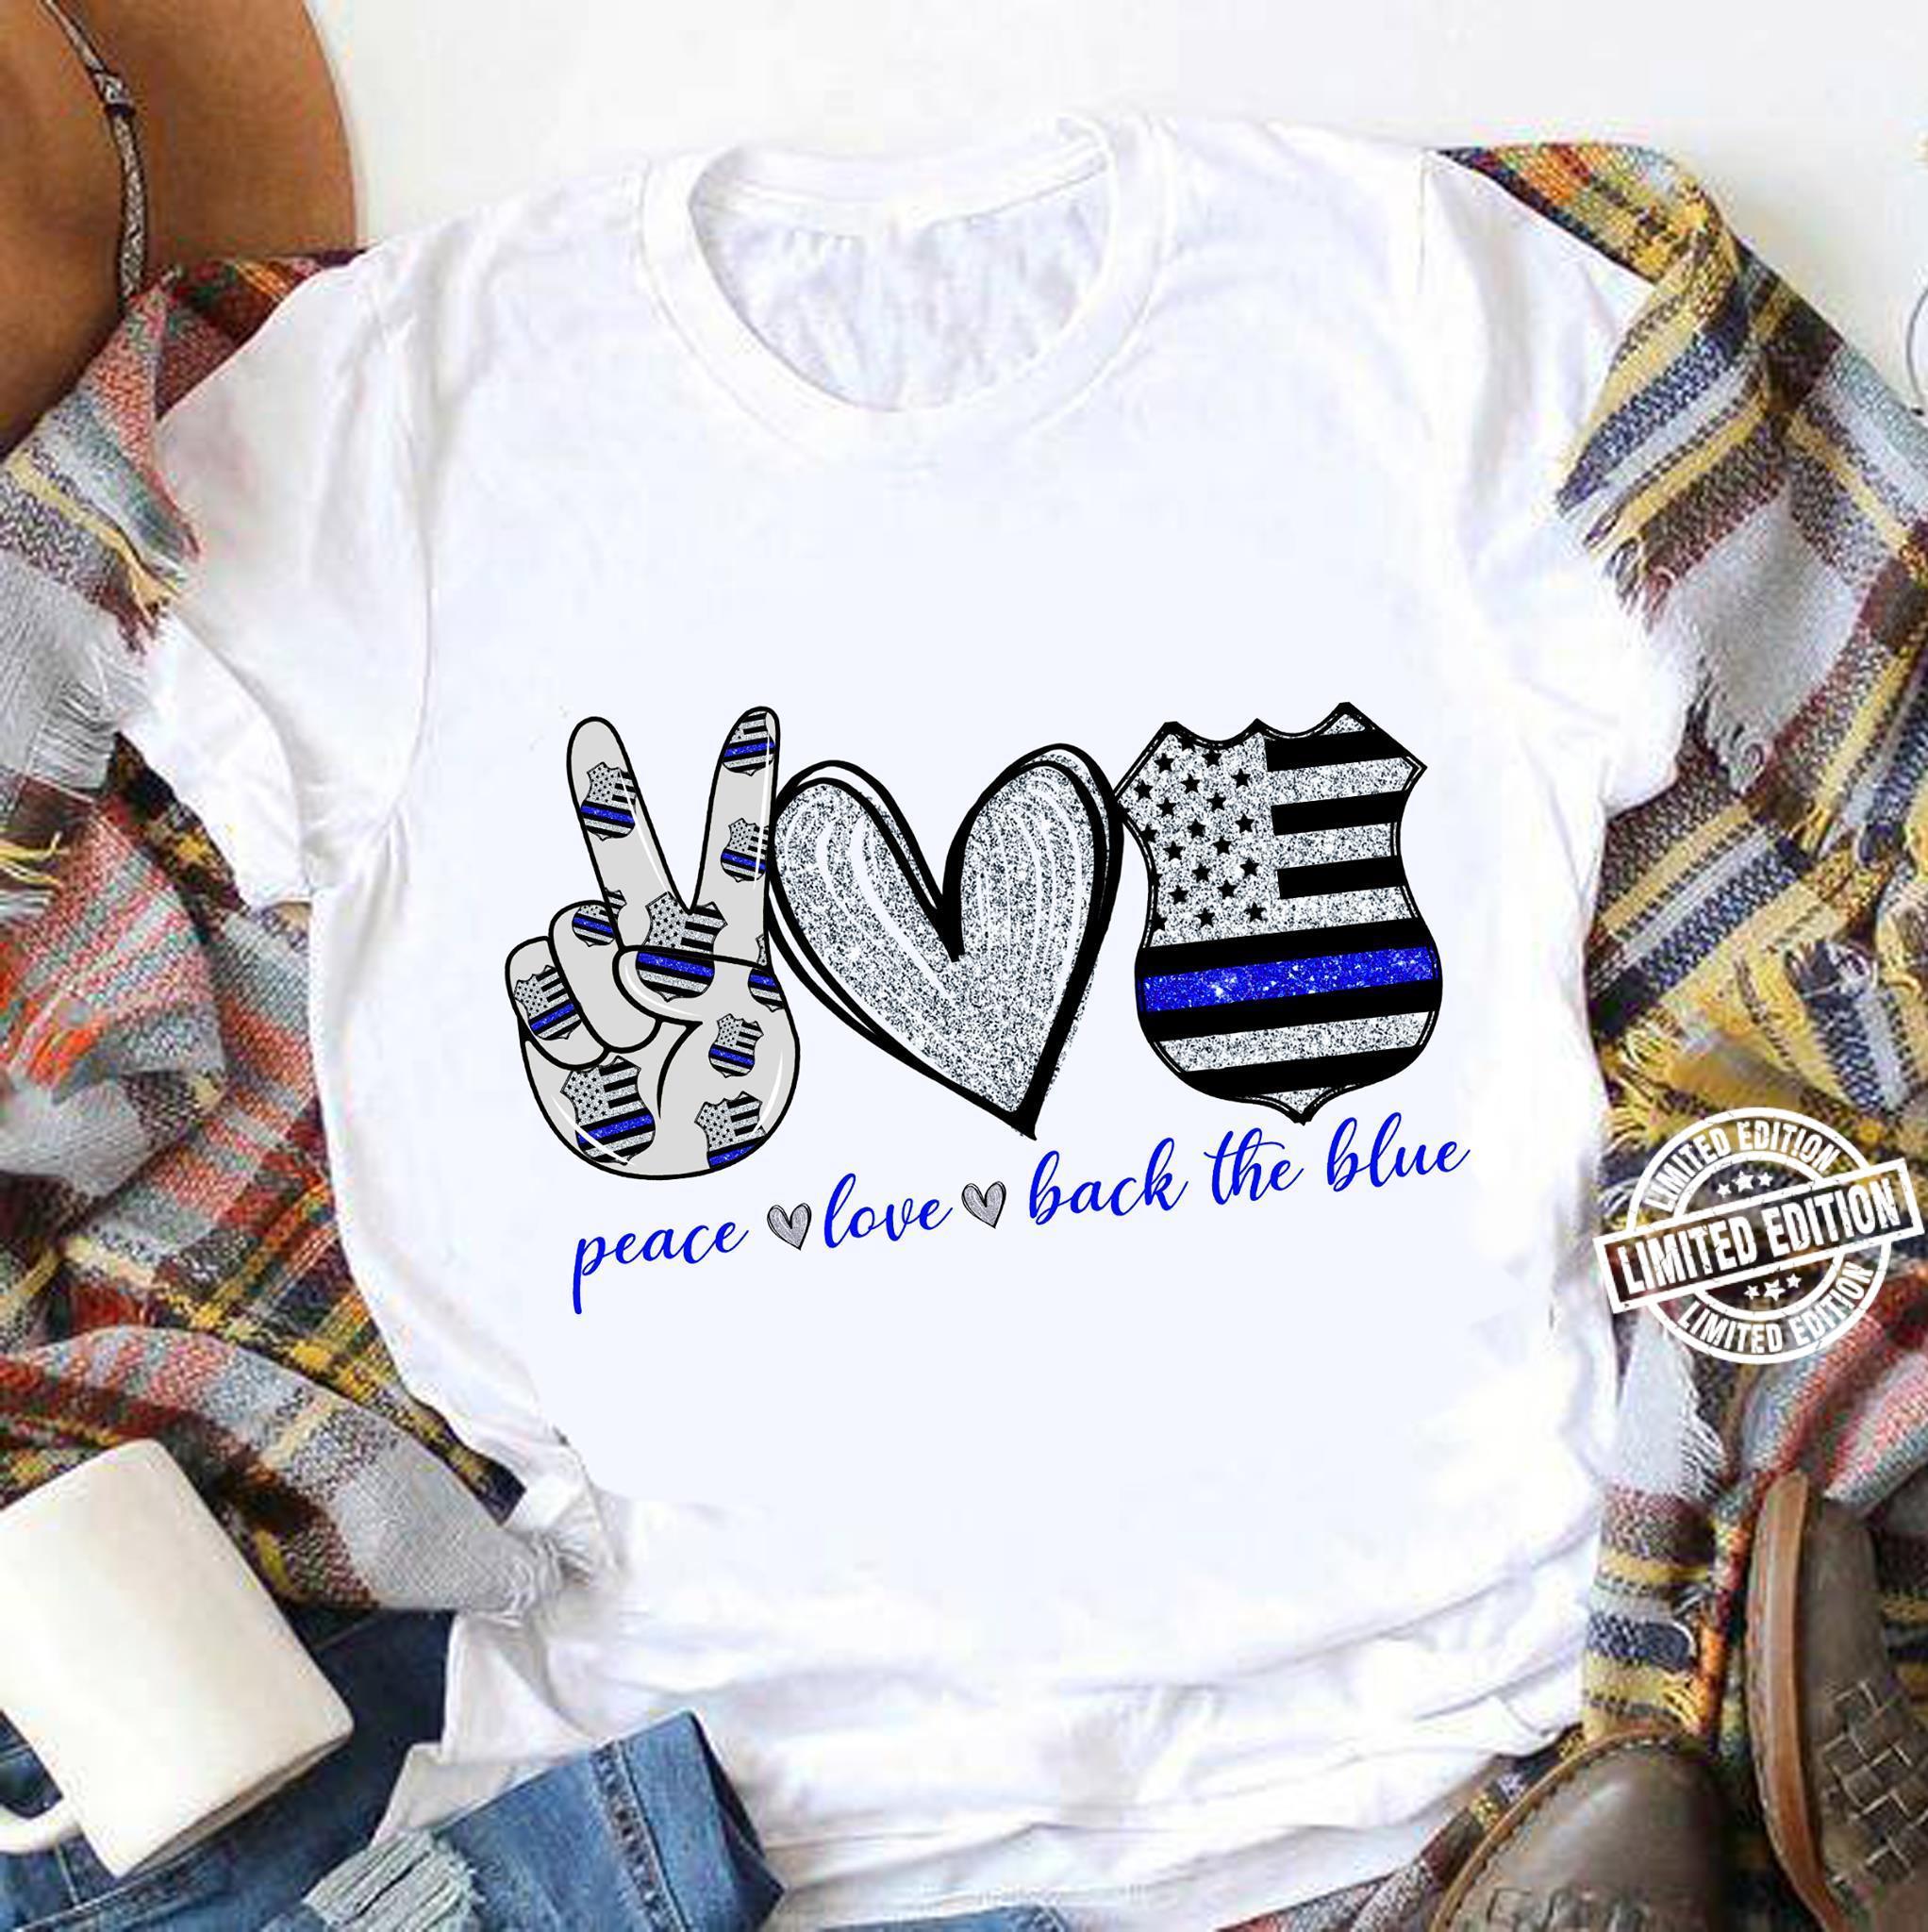 Peace love back the blue shirt